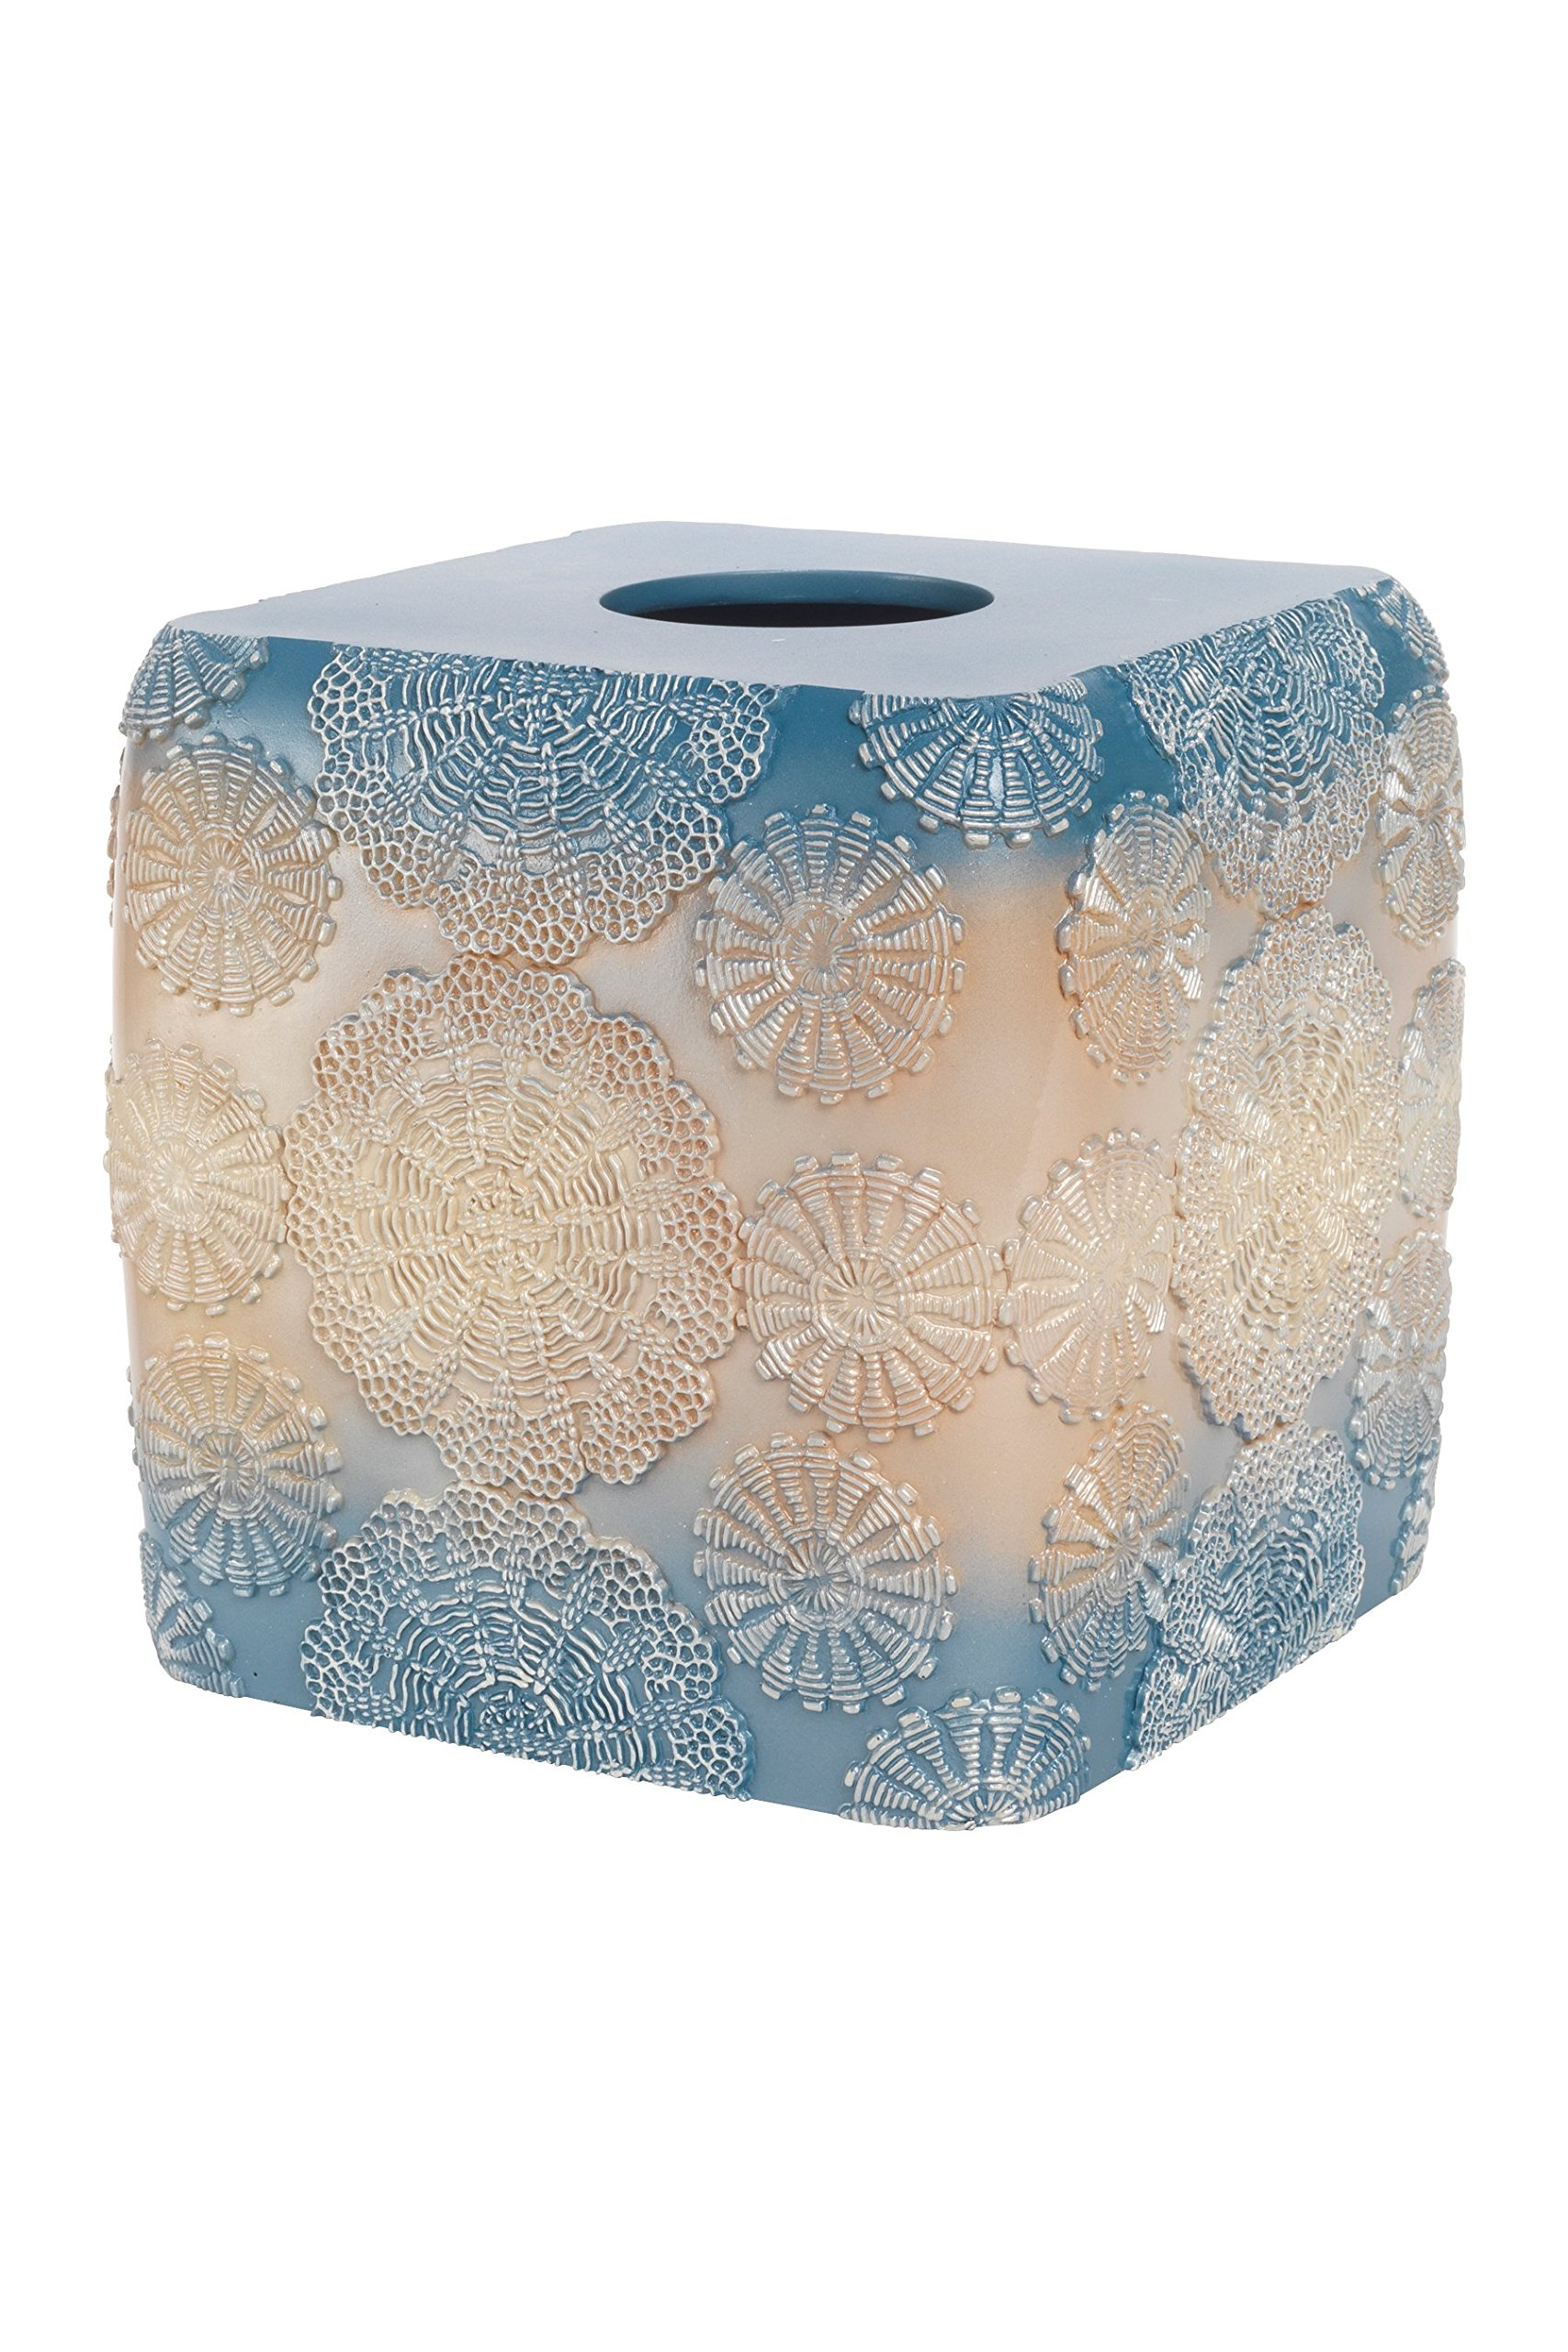 Popular Bath Tissue Box, Fallon Collection, Teal/Beige by Popular Bath